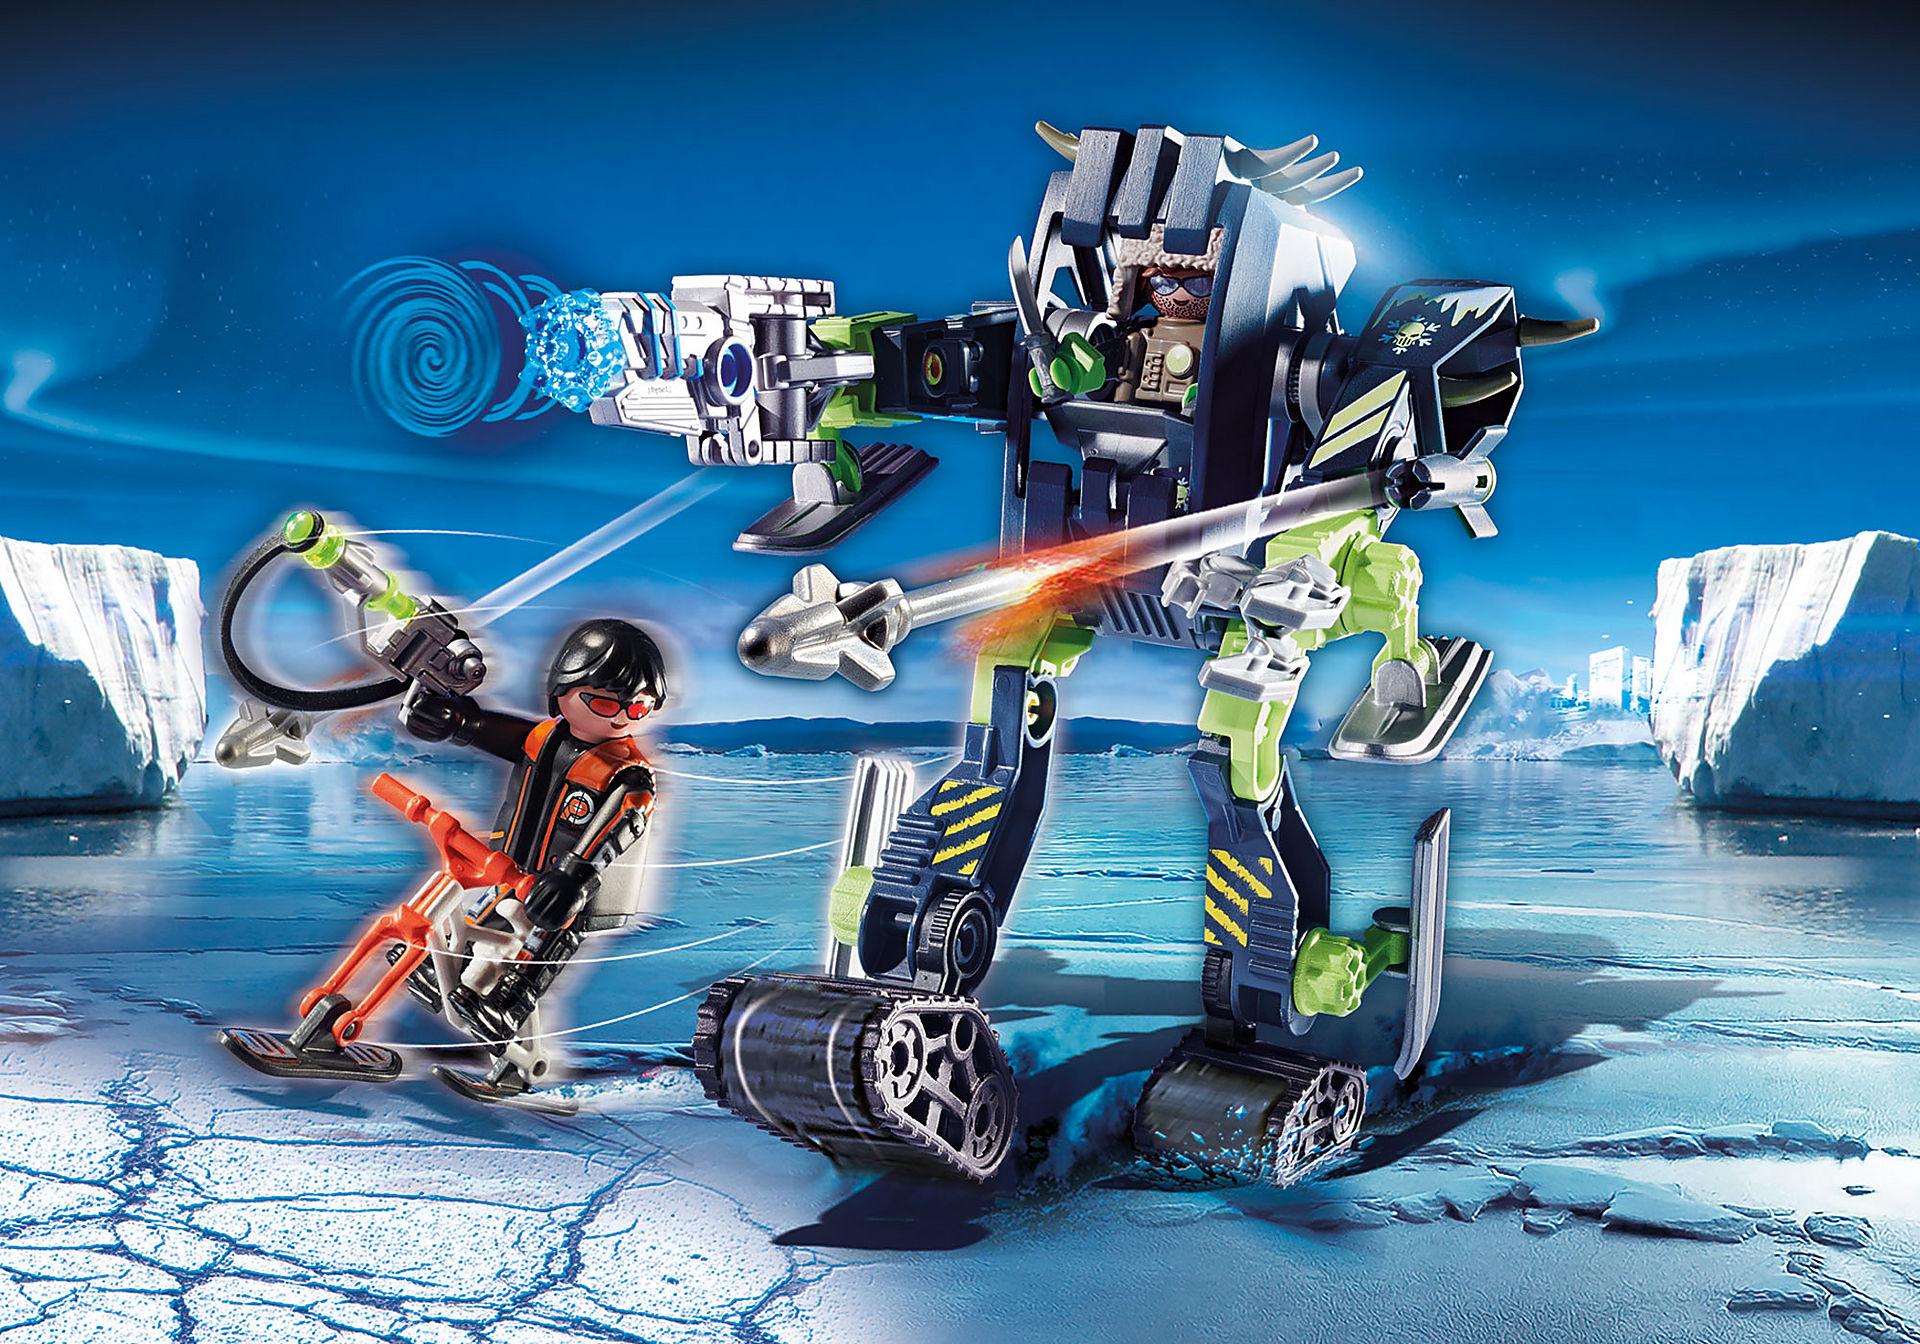 70233 Arktiske rebeller isrobot zoom image1